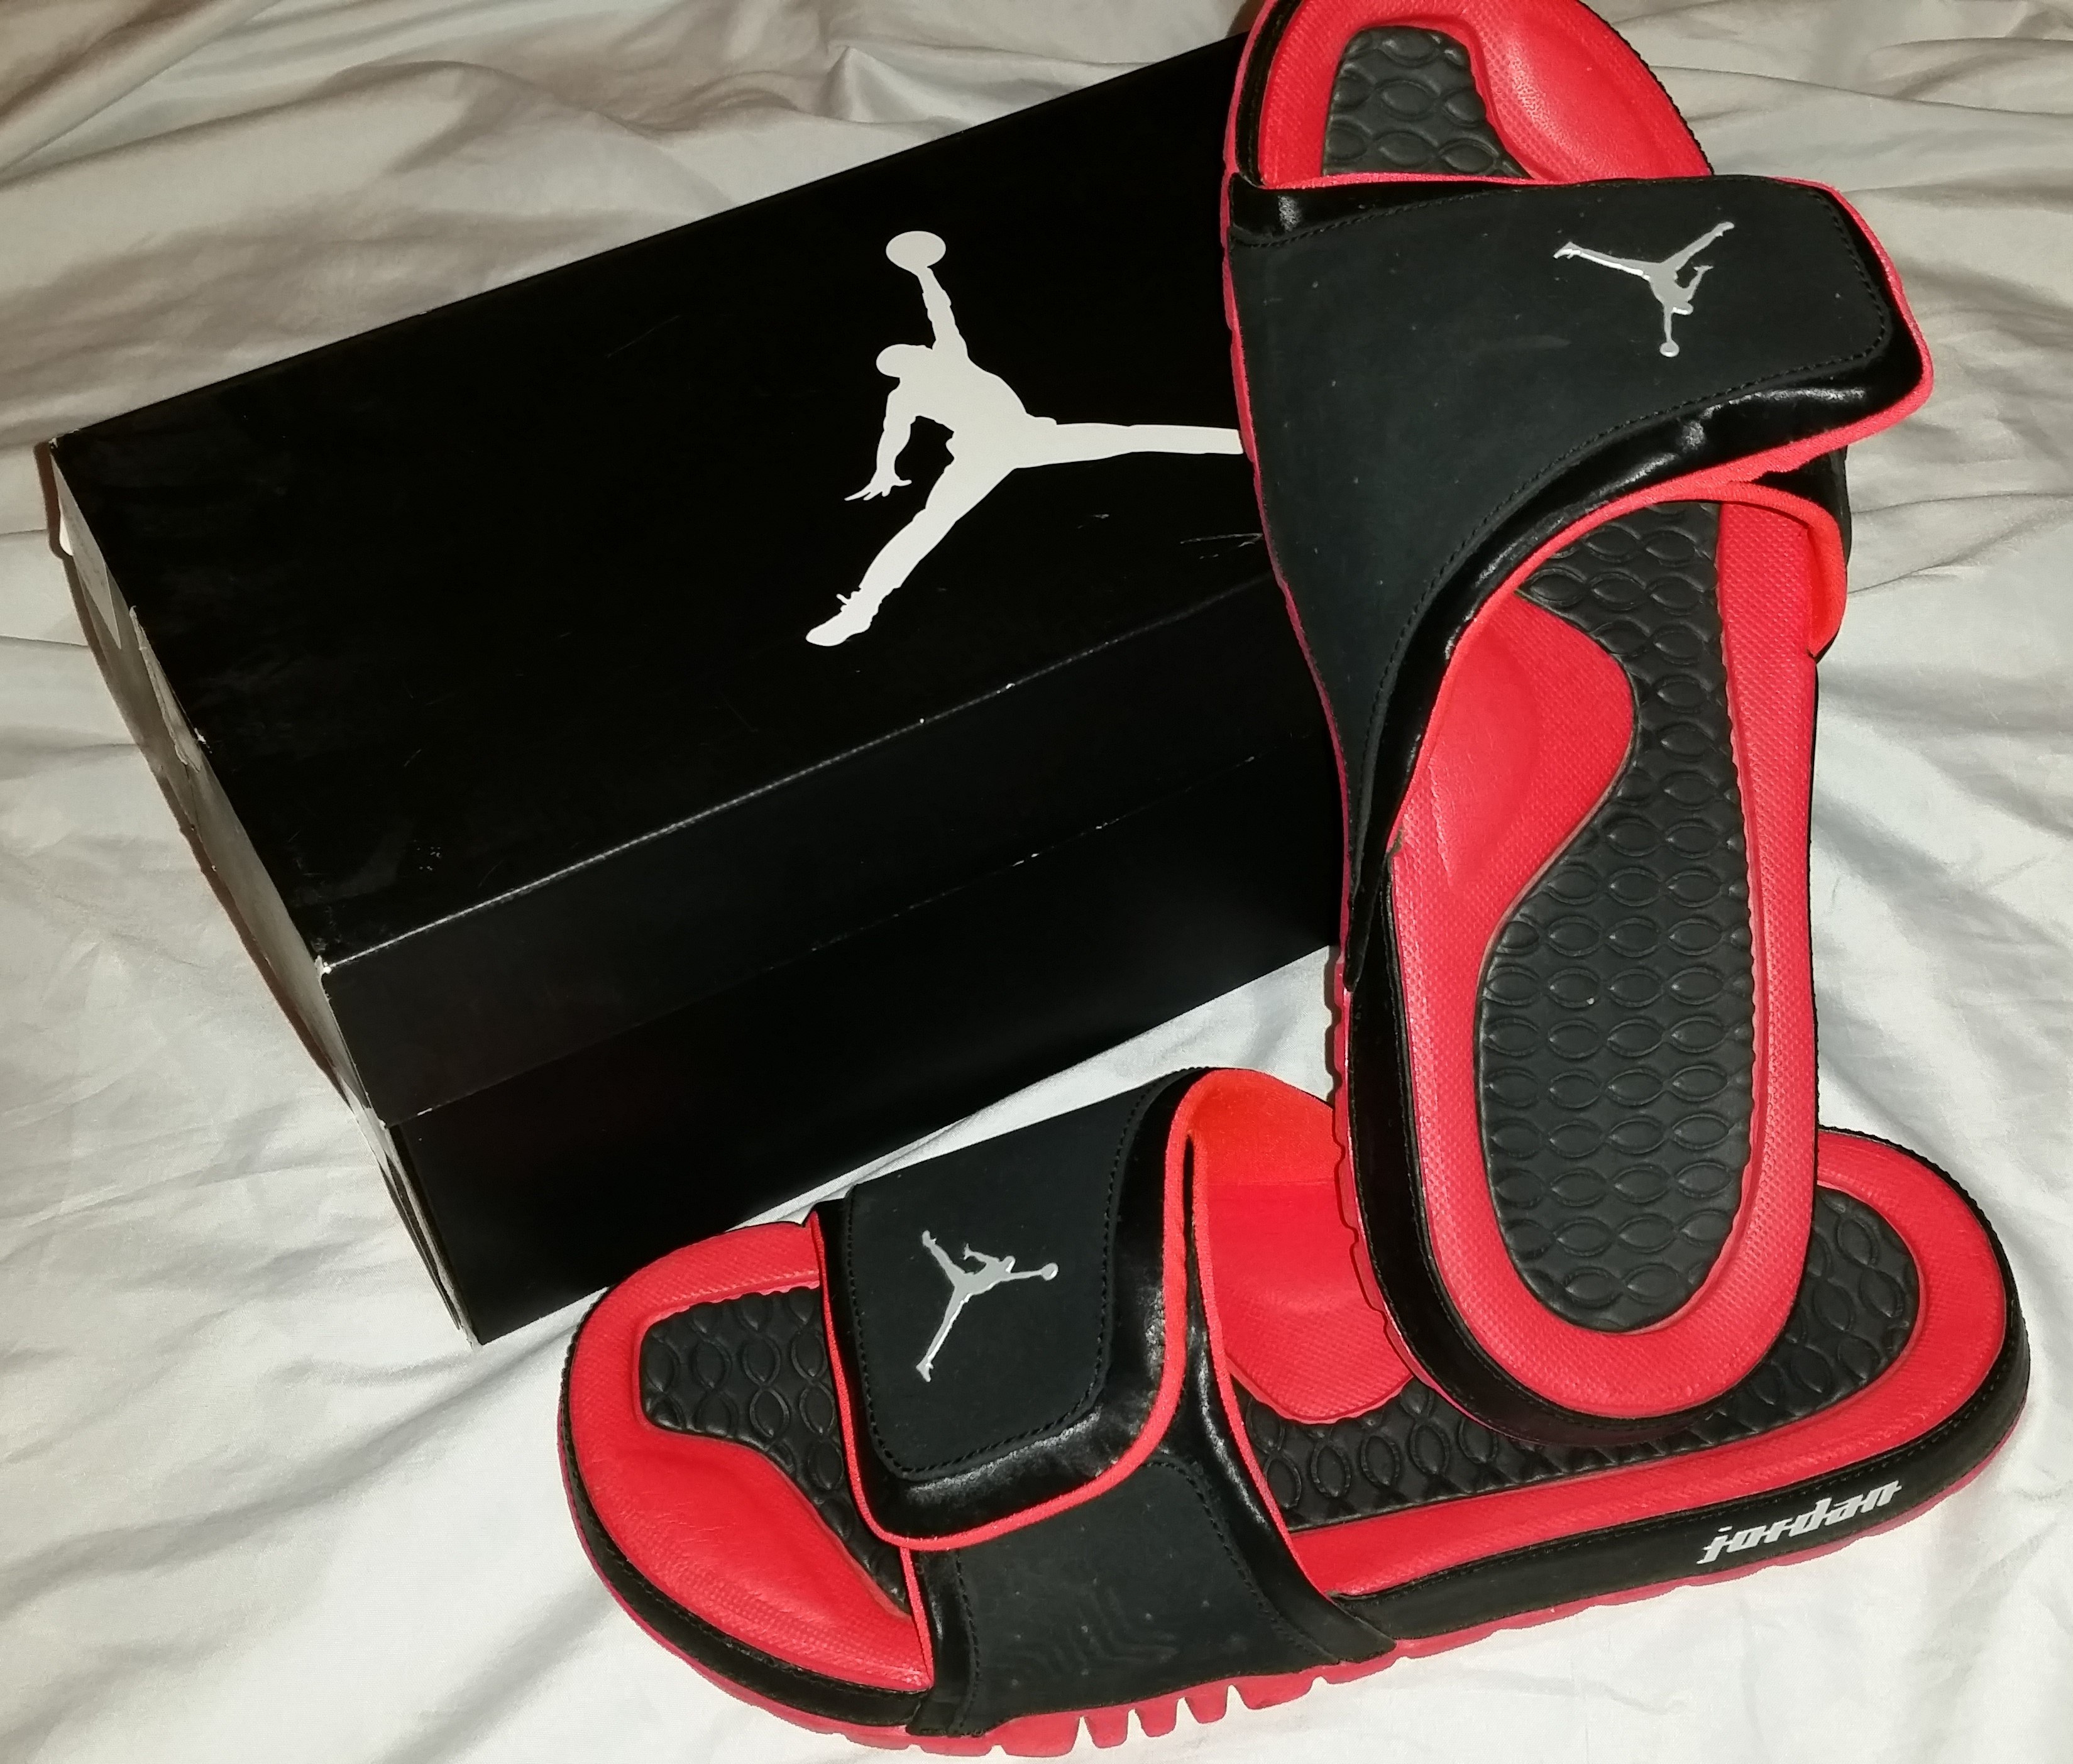 c7cfef834f3d Mens Jordan Hydro 2 black   bright crimson slippers sz 9 on Storenvy